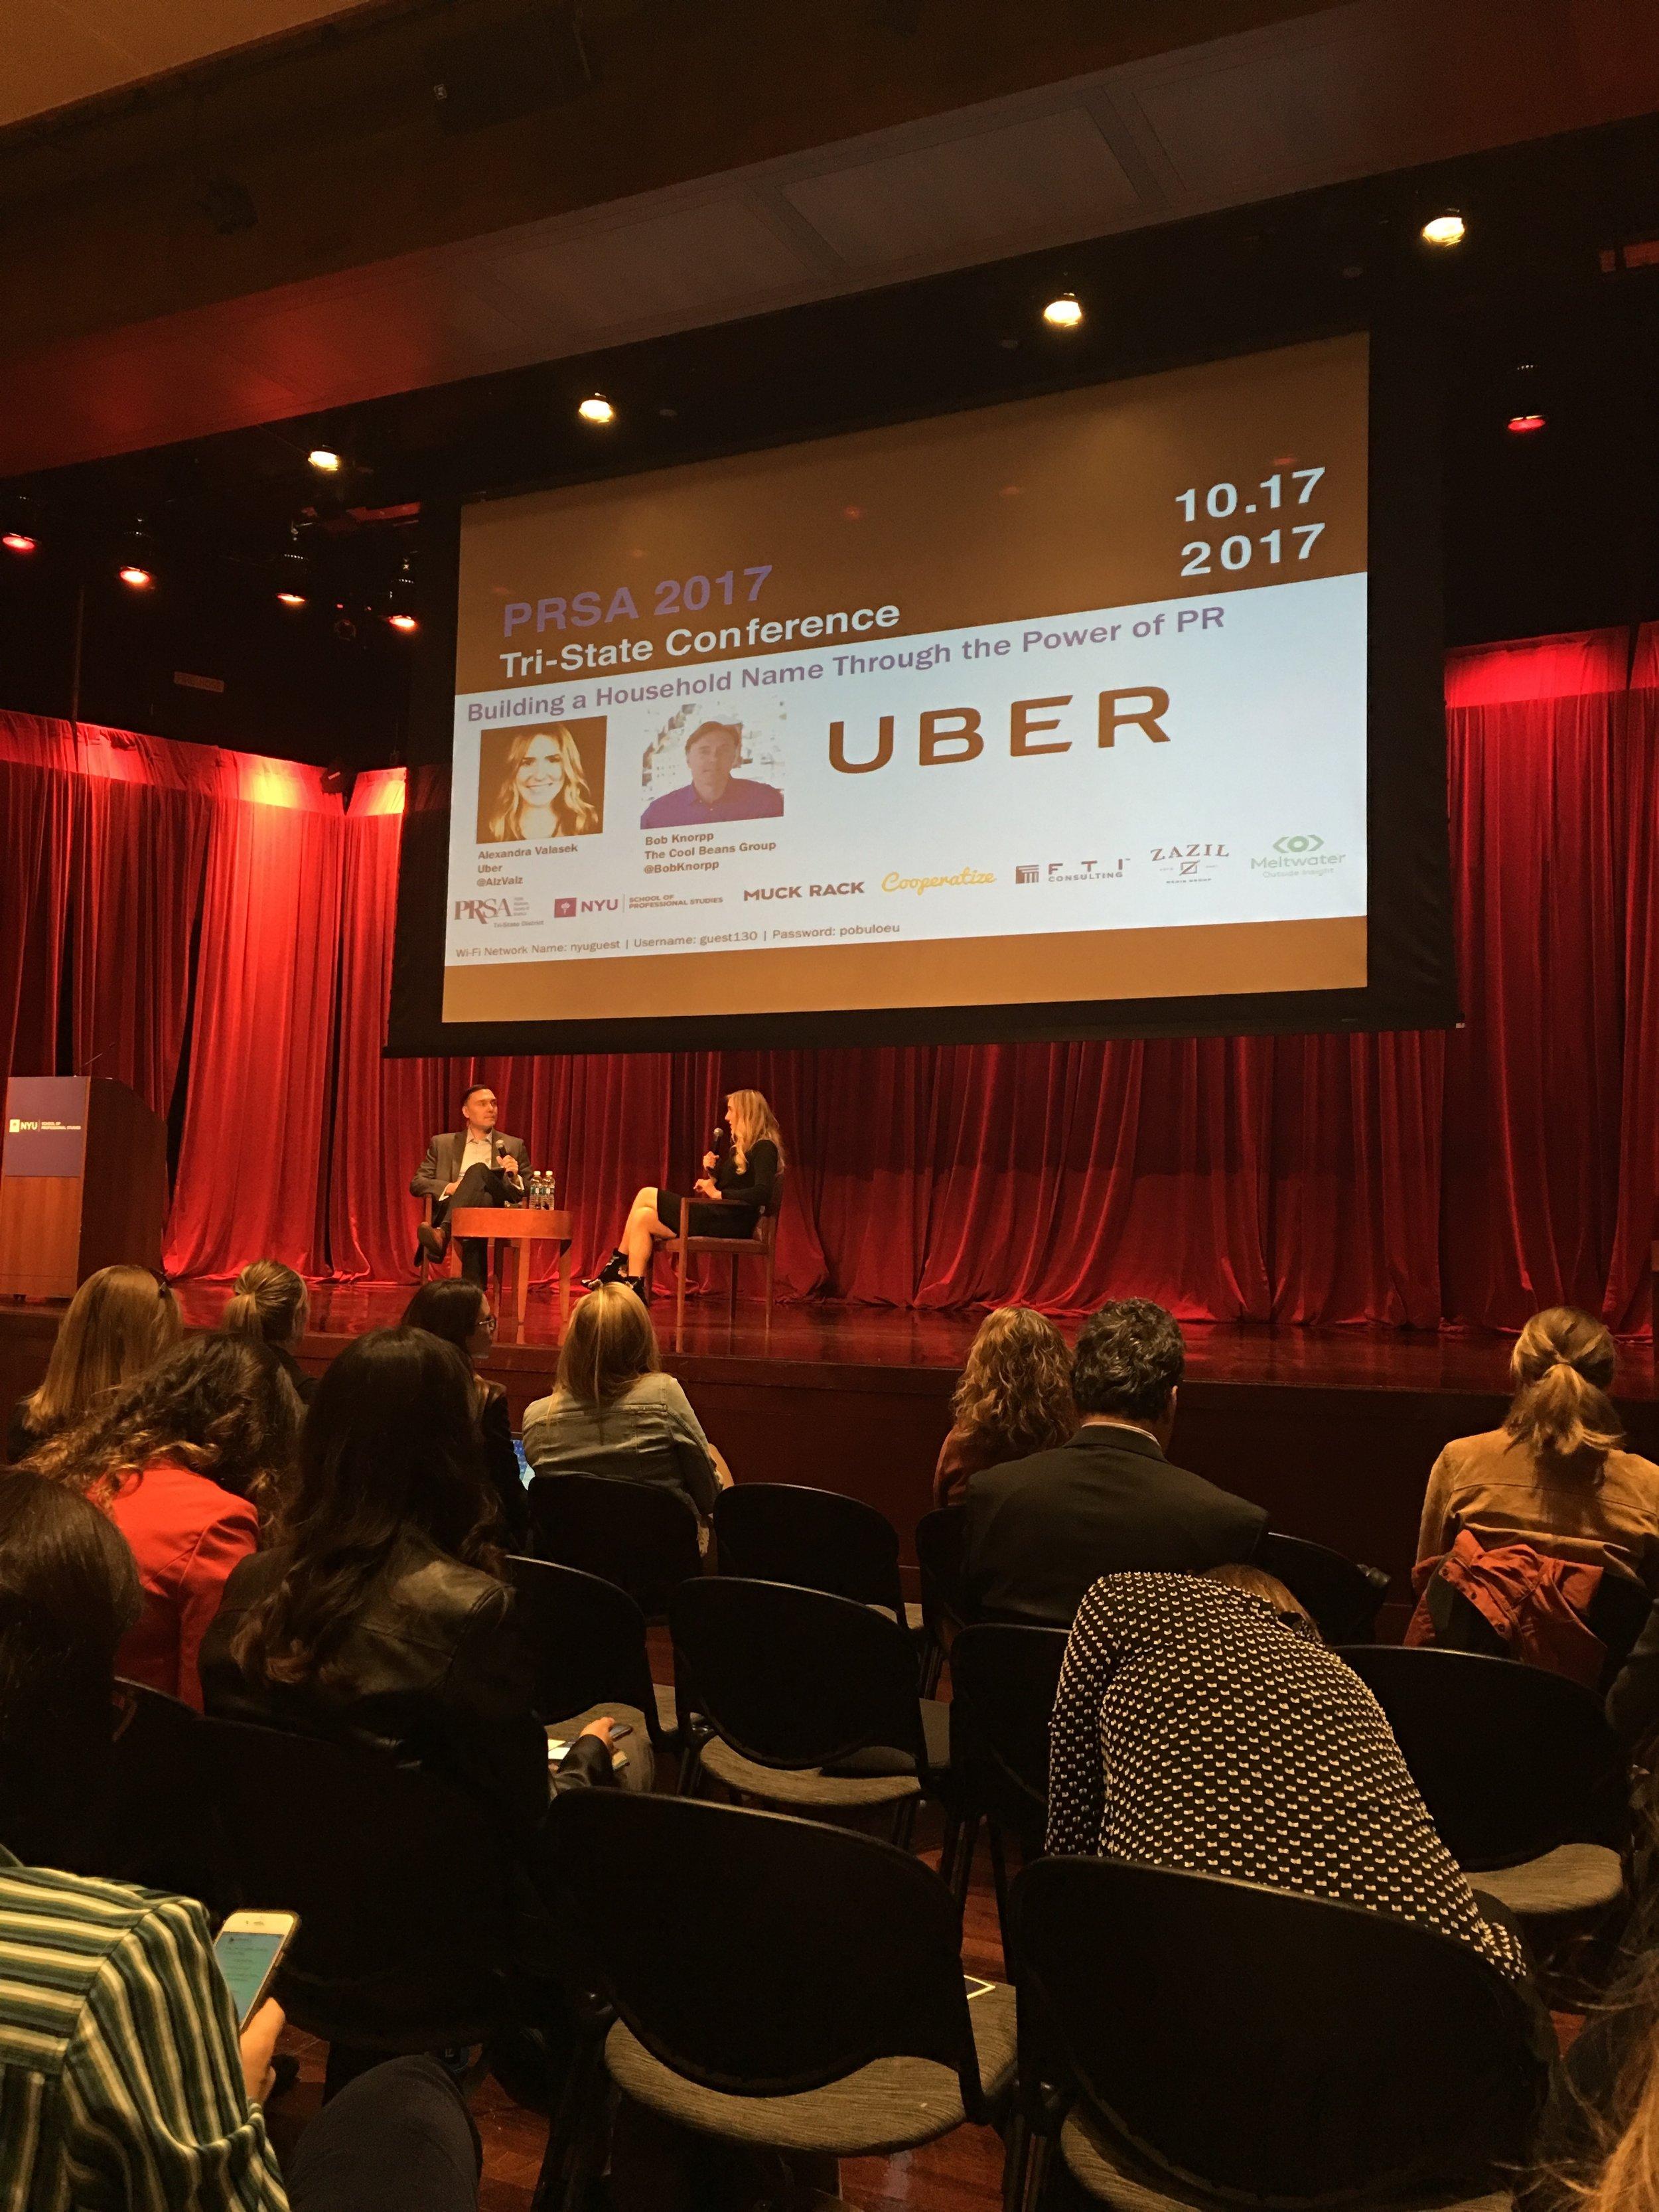 Bob Knorpp interviews Uber's Alexandra Valasek